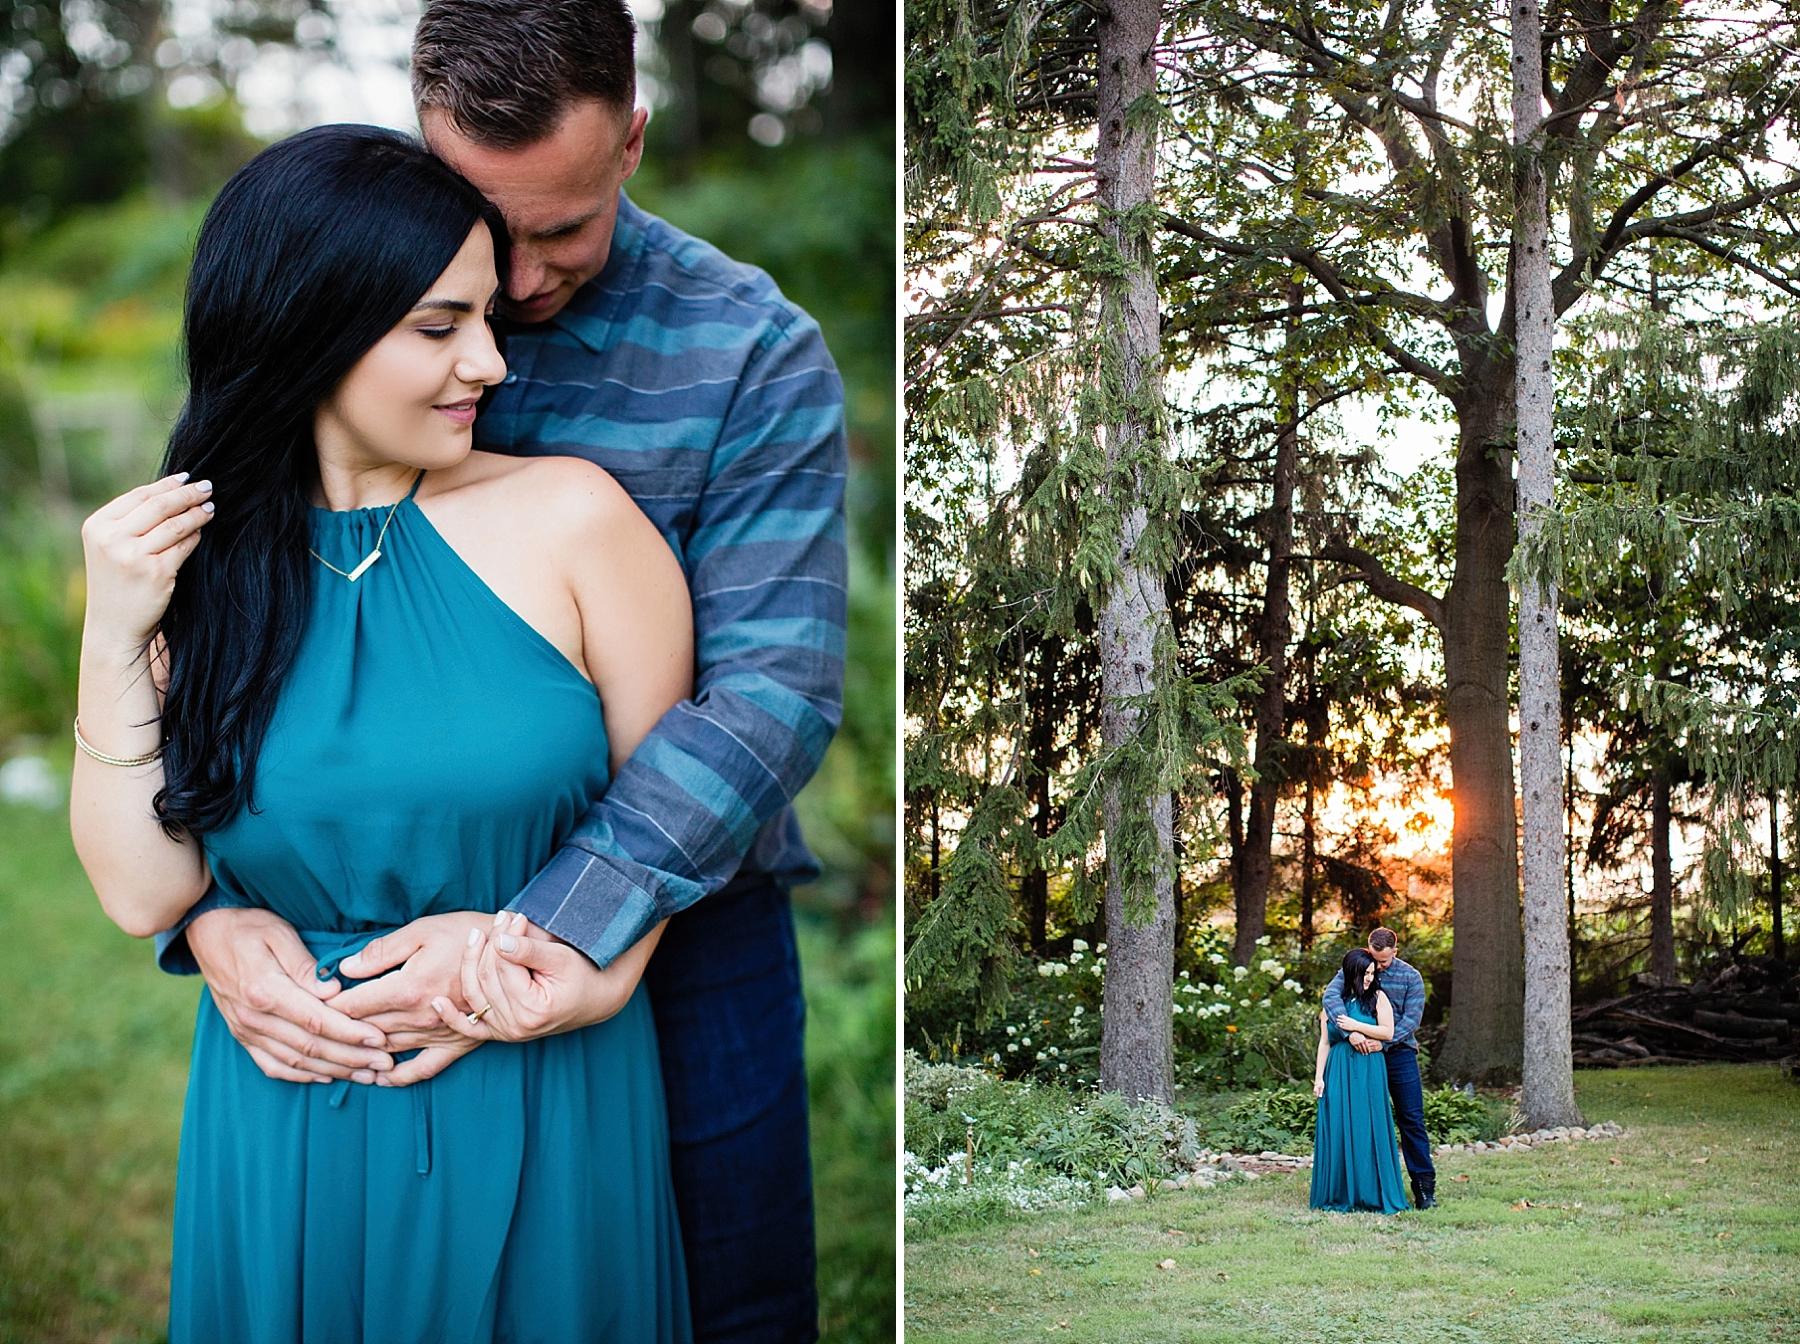 windsor-wedding-engagement-photographer-eryn-shea-photography-field-of-flowers_0028.jpg